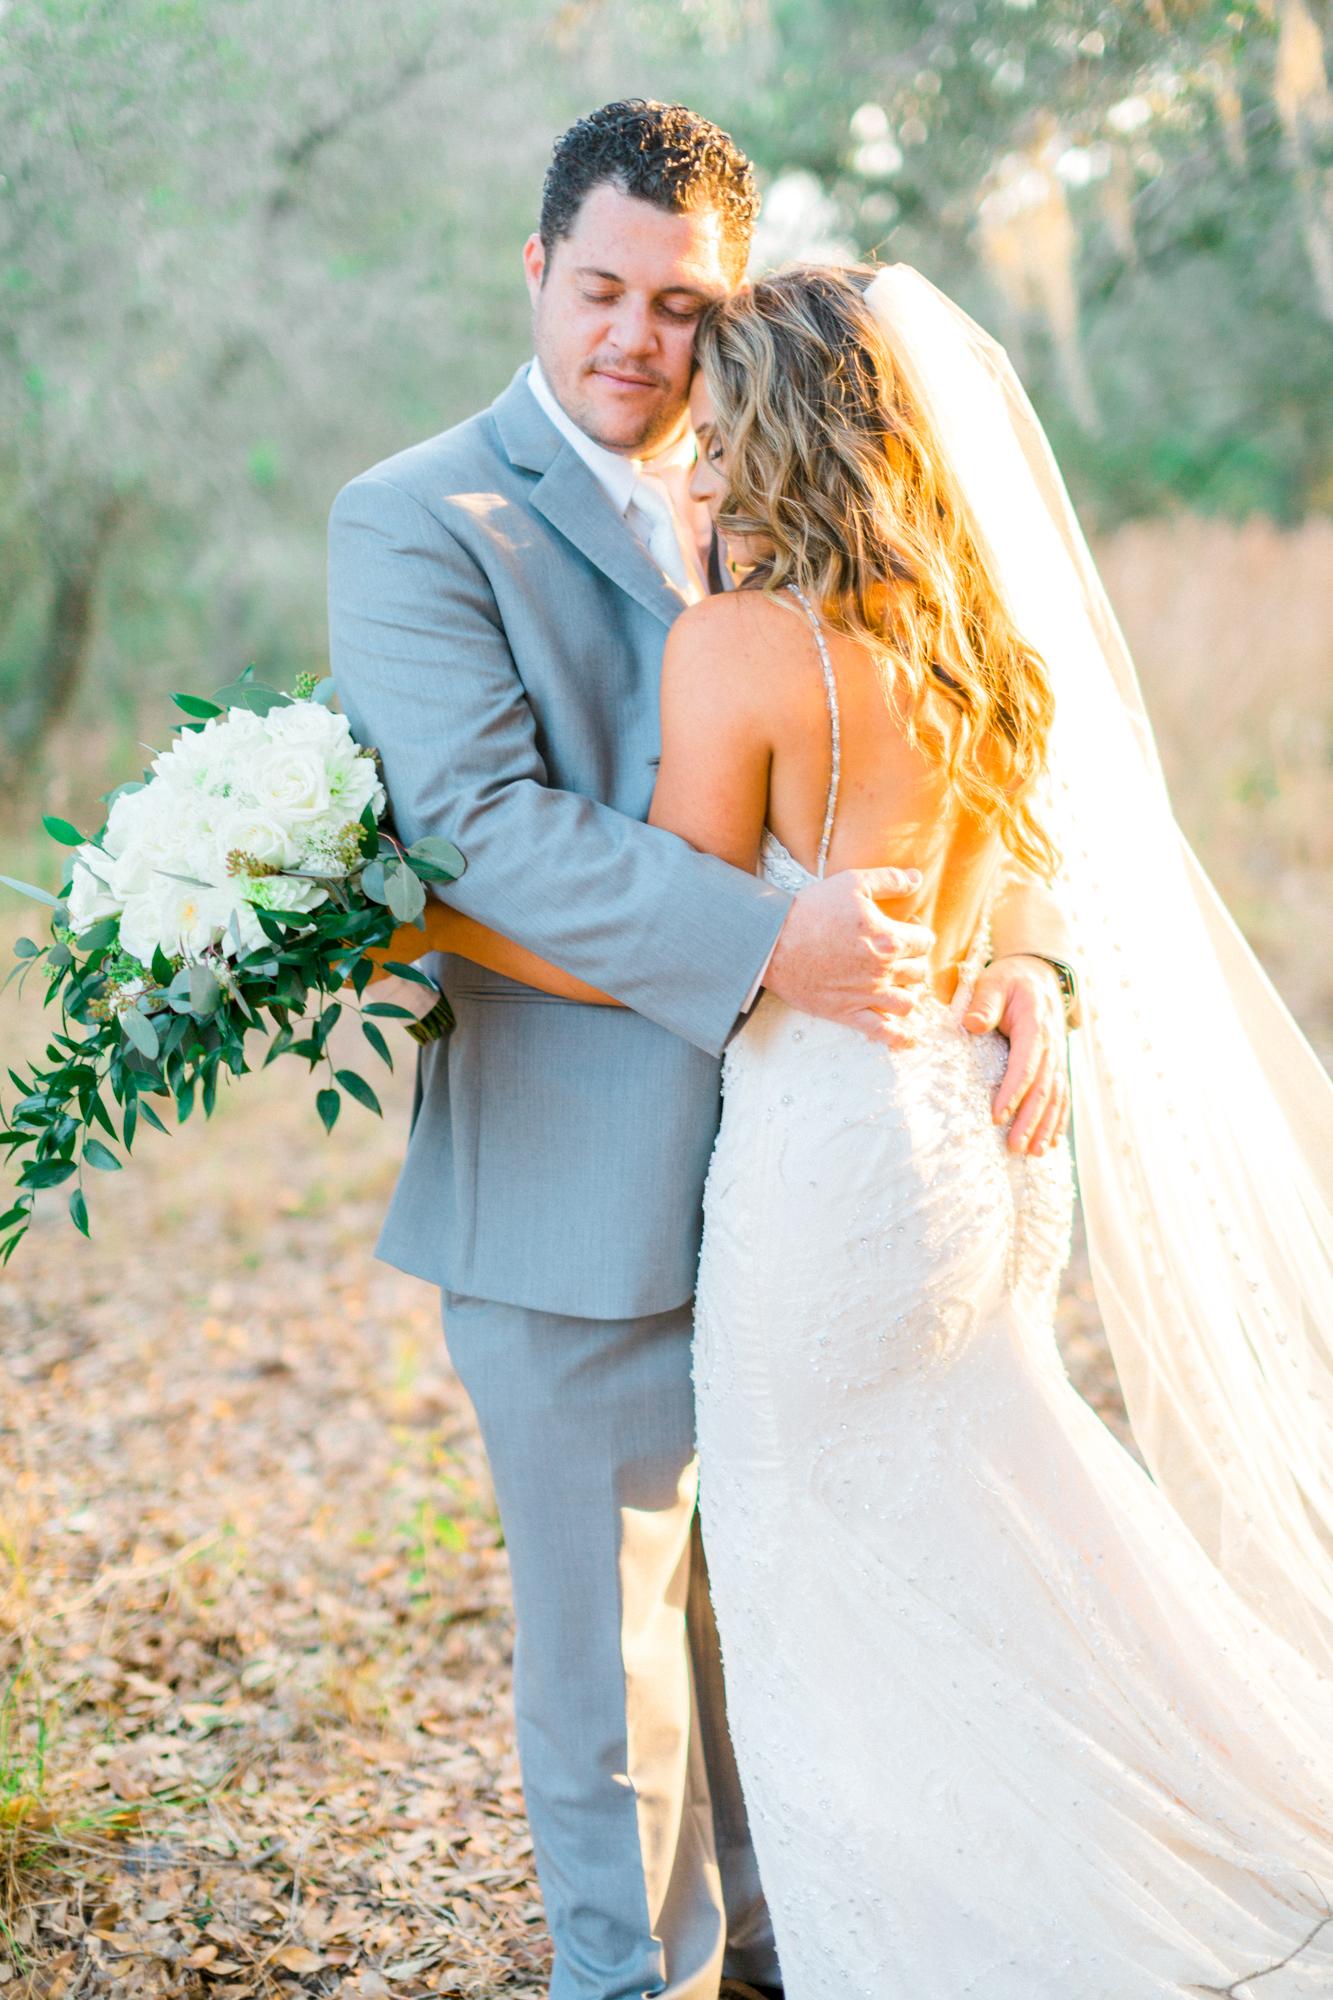 jessica-bellinger-photography-harmony-golf-preserve-wedding-photos-9332.jpg